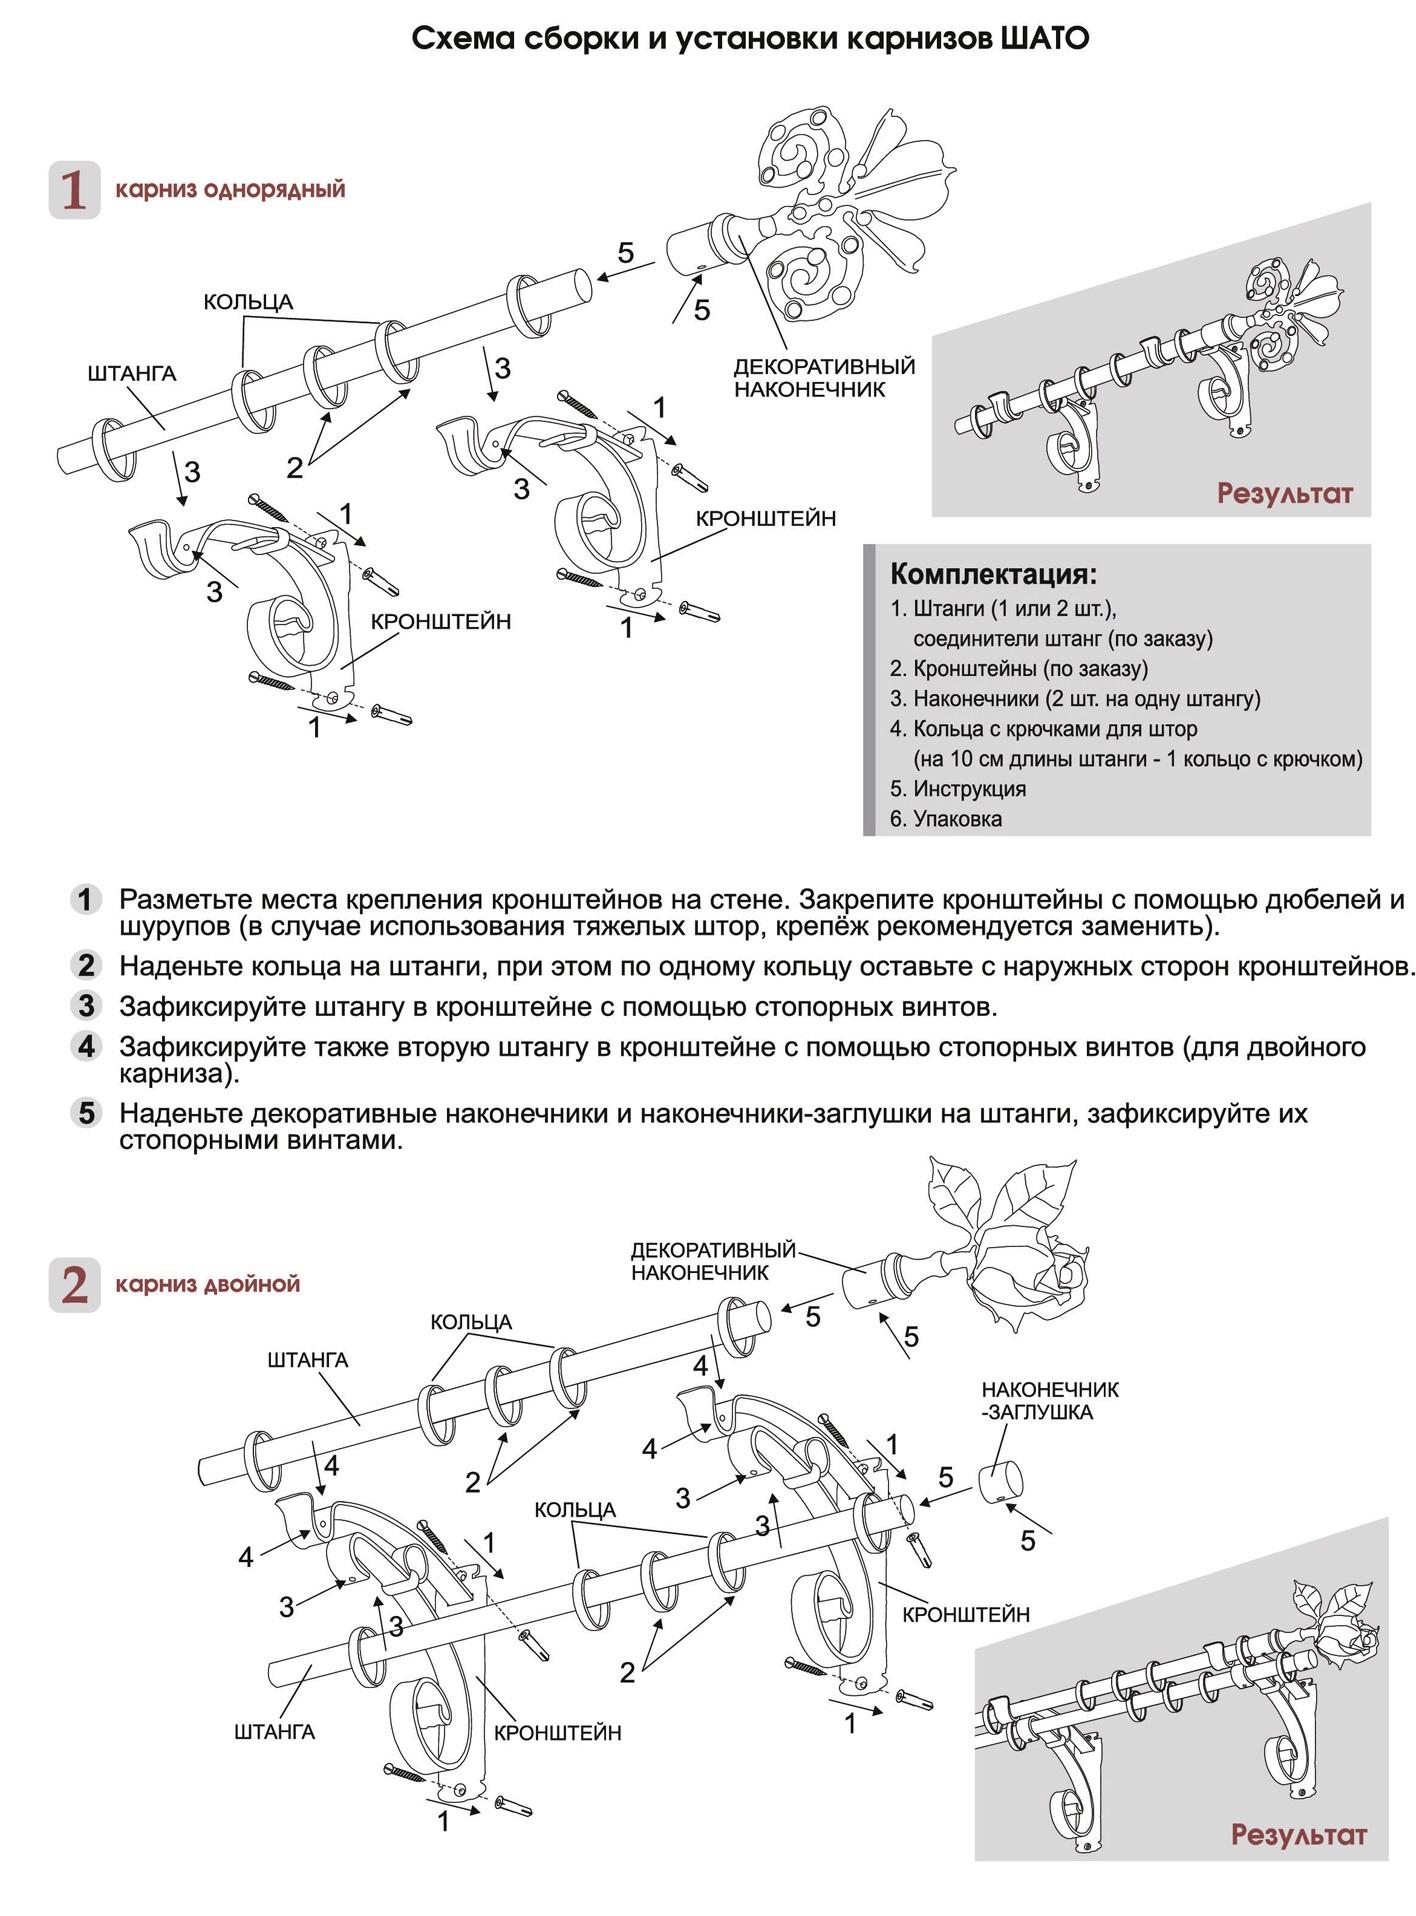 Схема сборки карнизов Шато